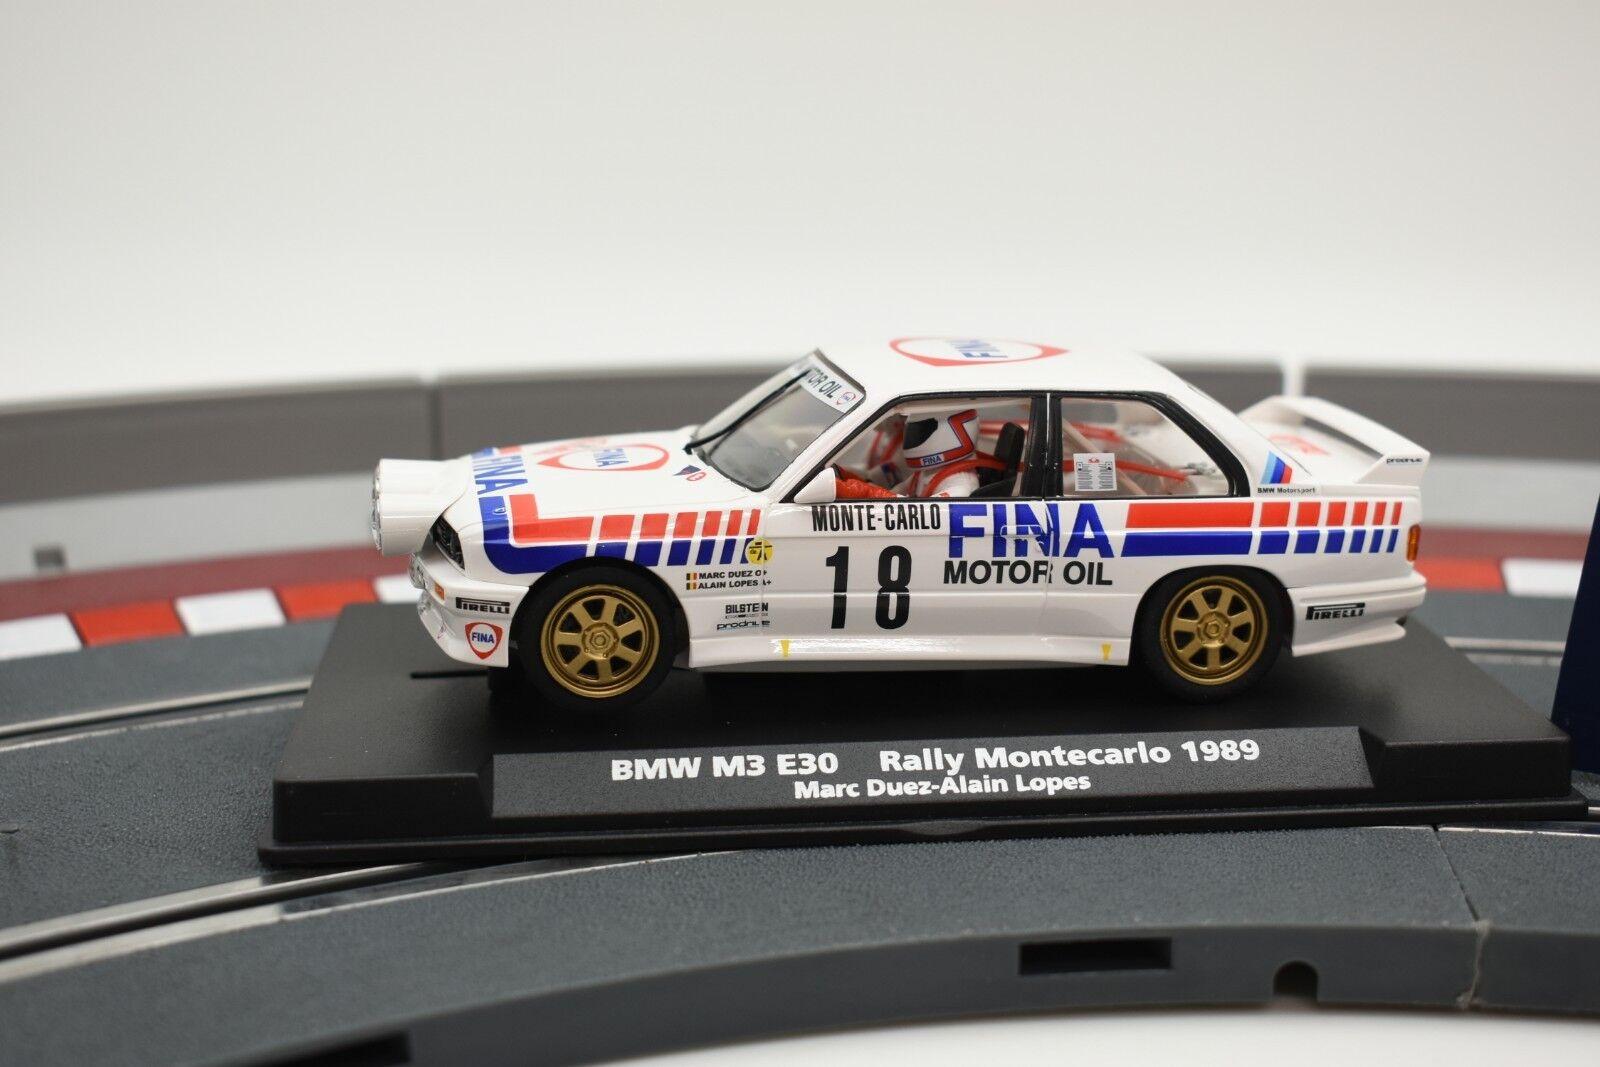 88204 FLY CAR MODEL 1 32 SLOT CAR BMW M3 E30 RALLY MONTECARLO 1989